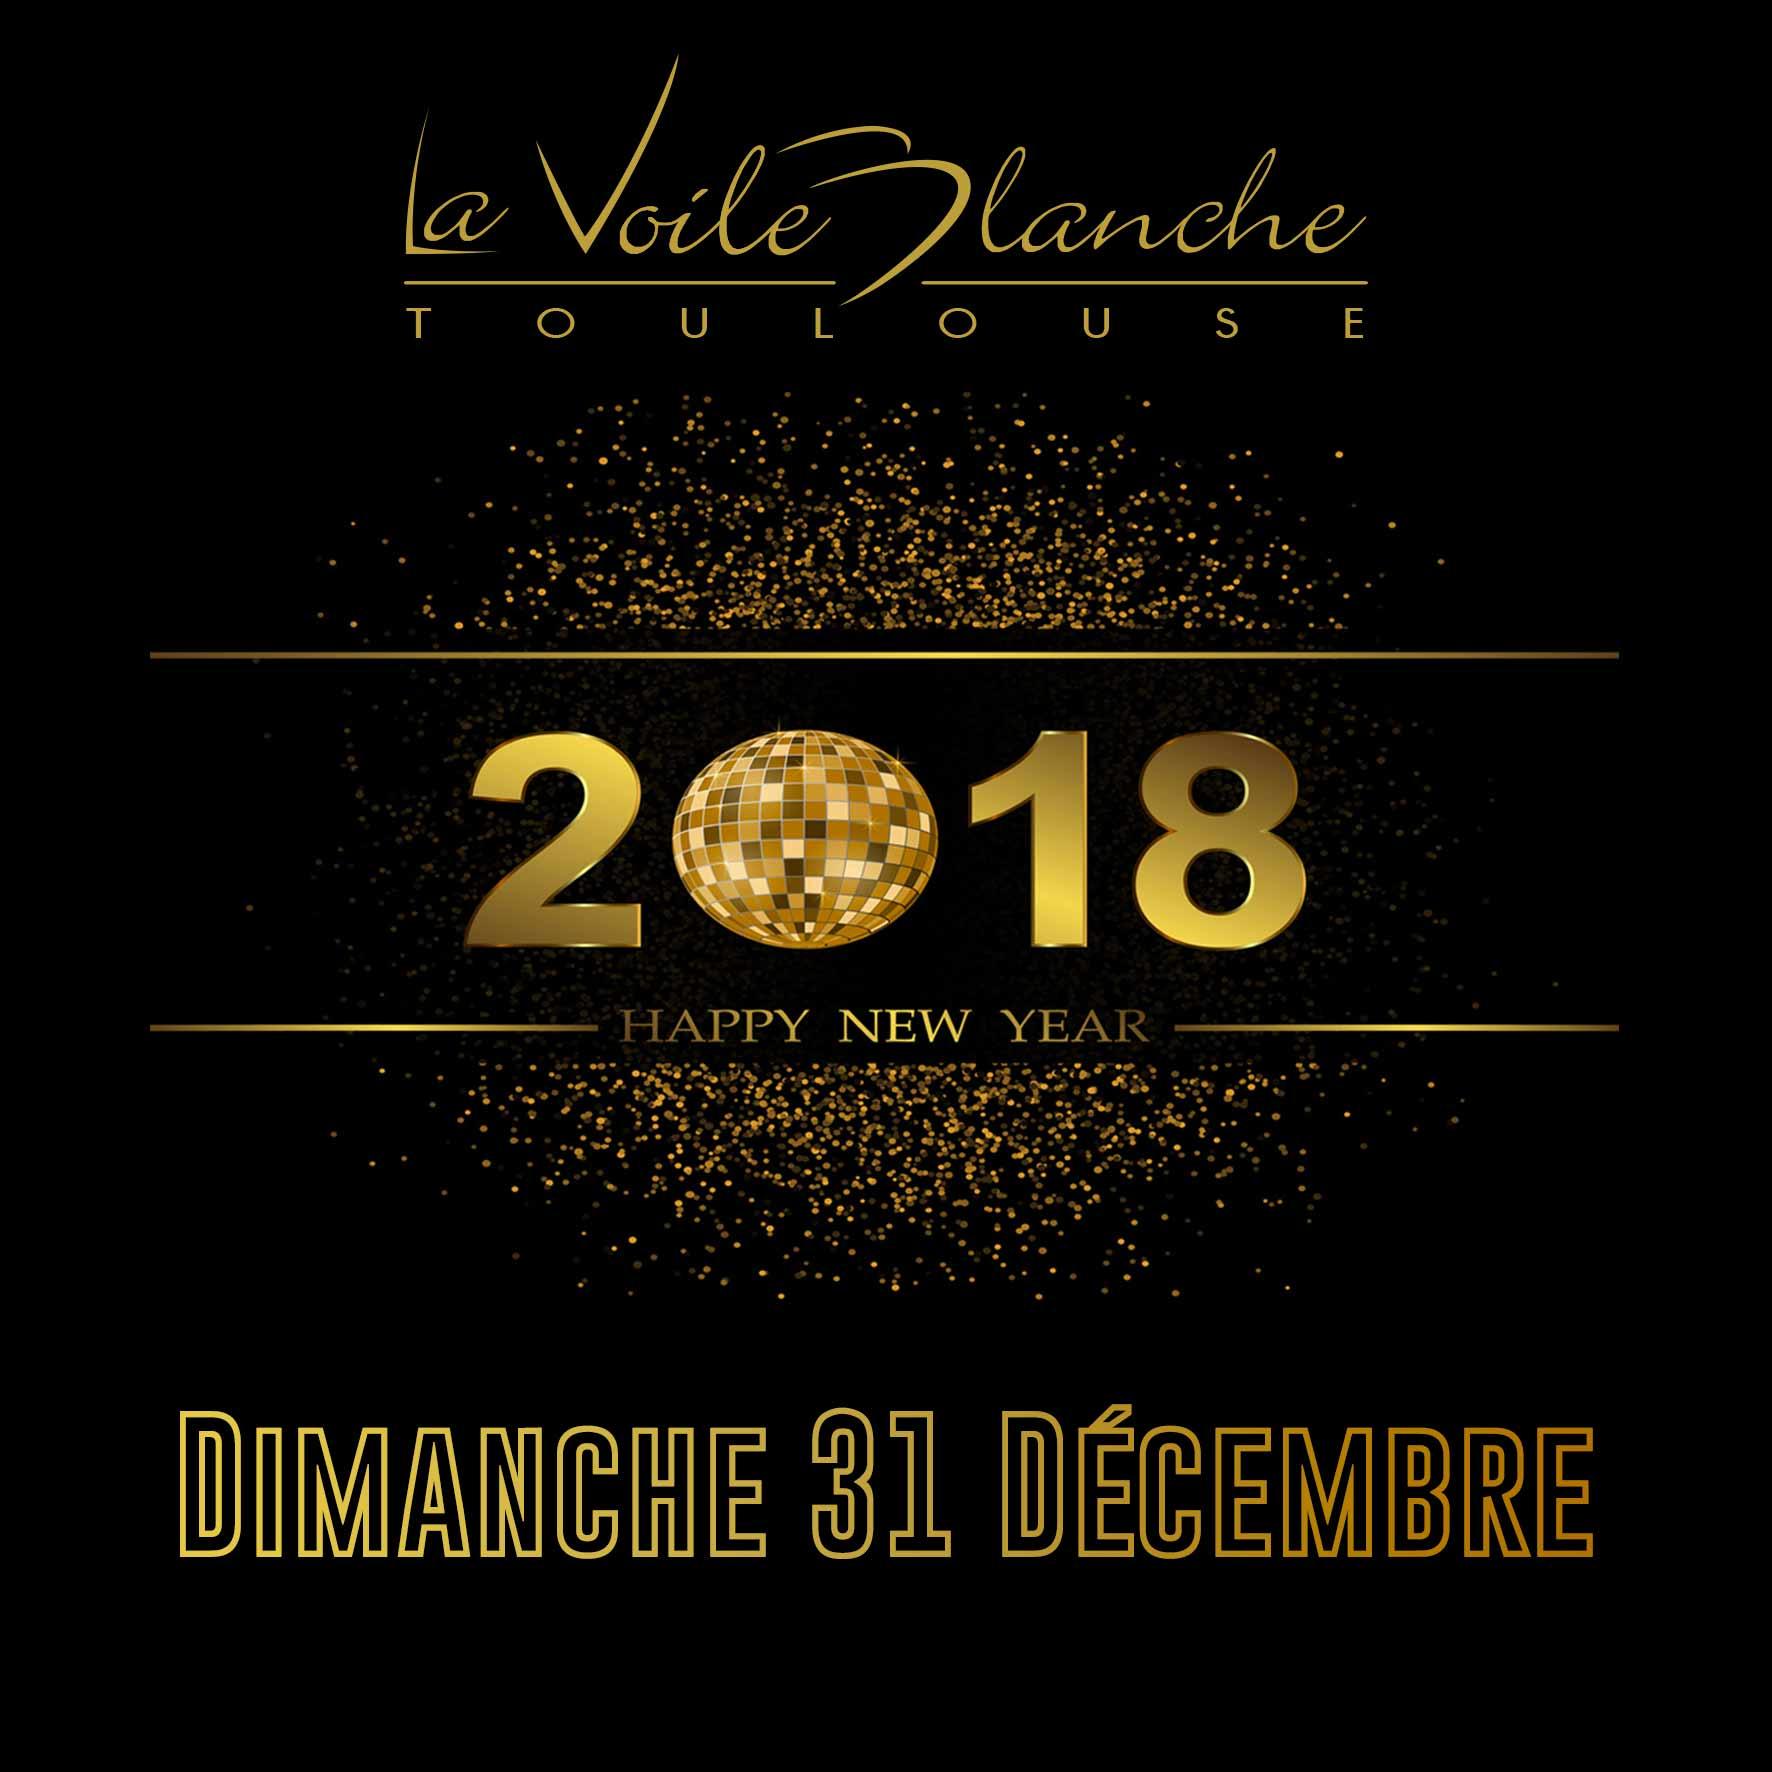 Reveillon 2018 dimanche 31 d cembre la voile blanche - Idee reveillon 31 decembre ...